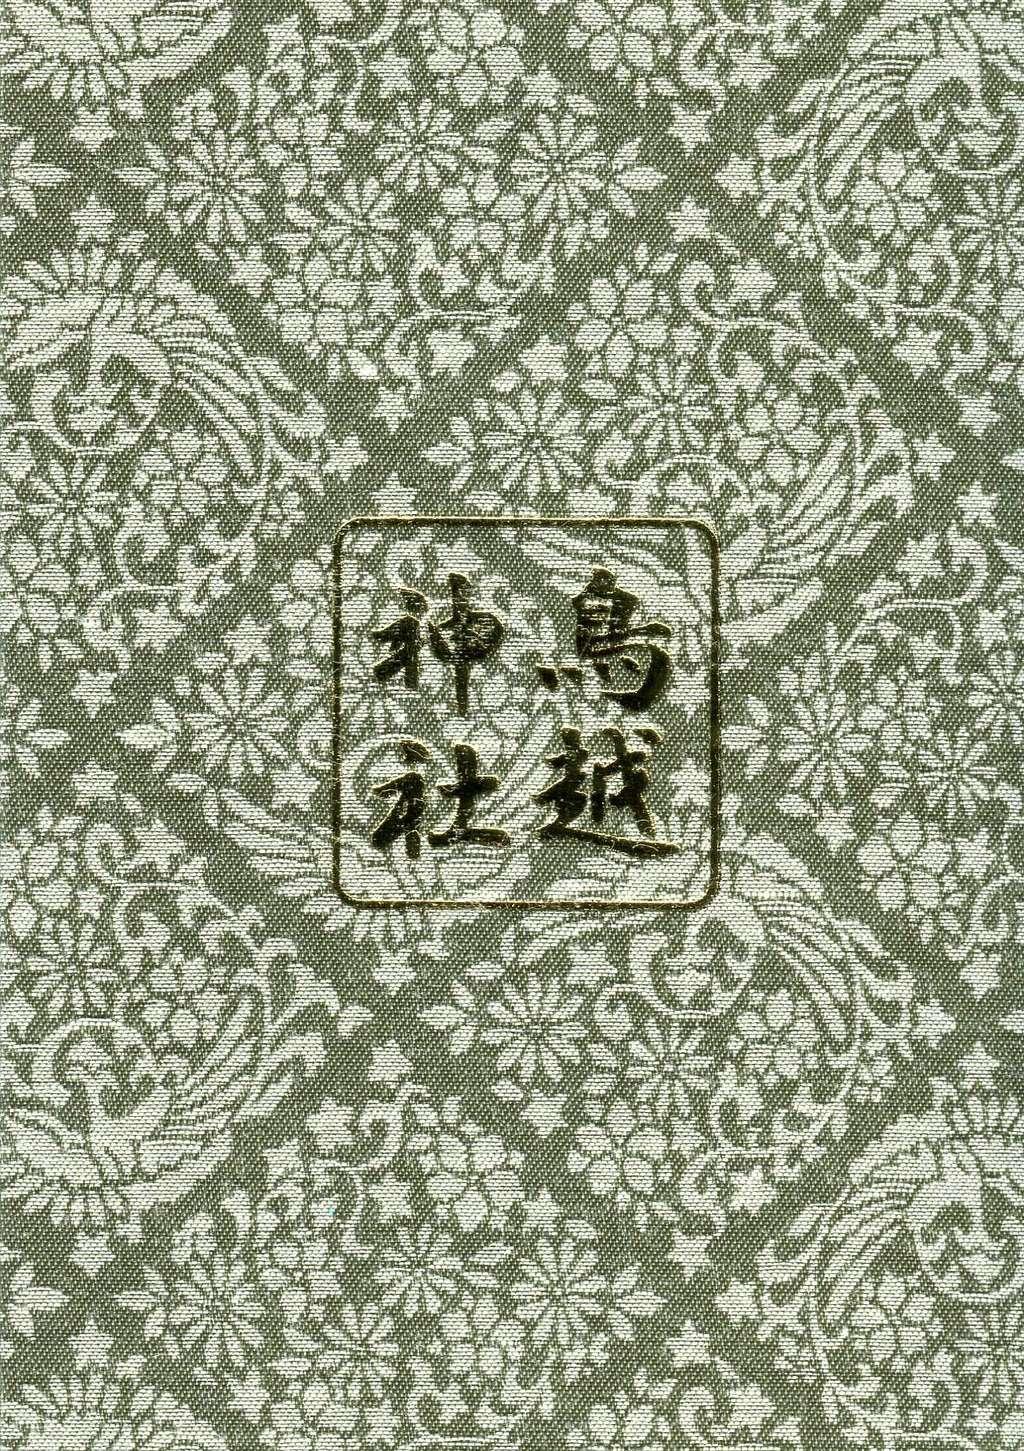 鳥越神社の御朱印帳